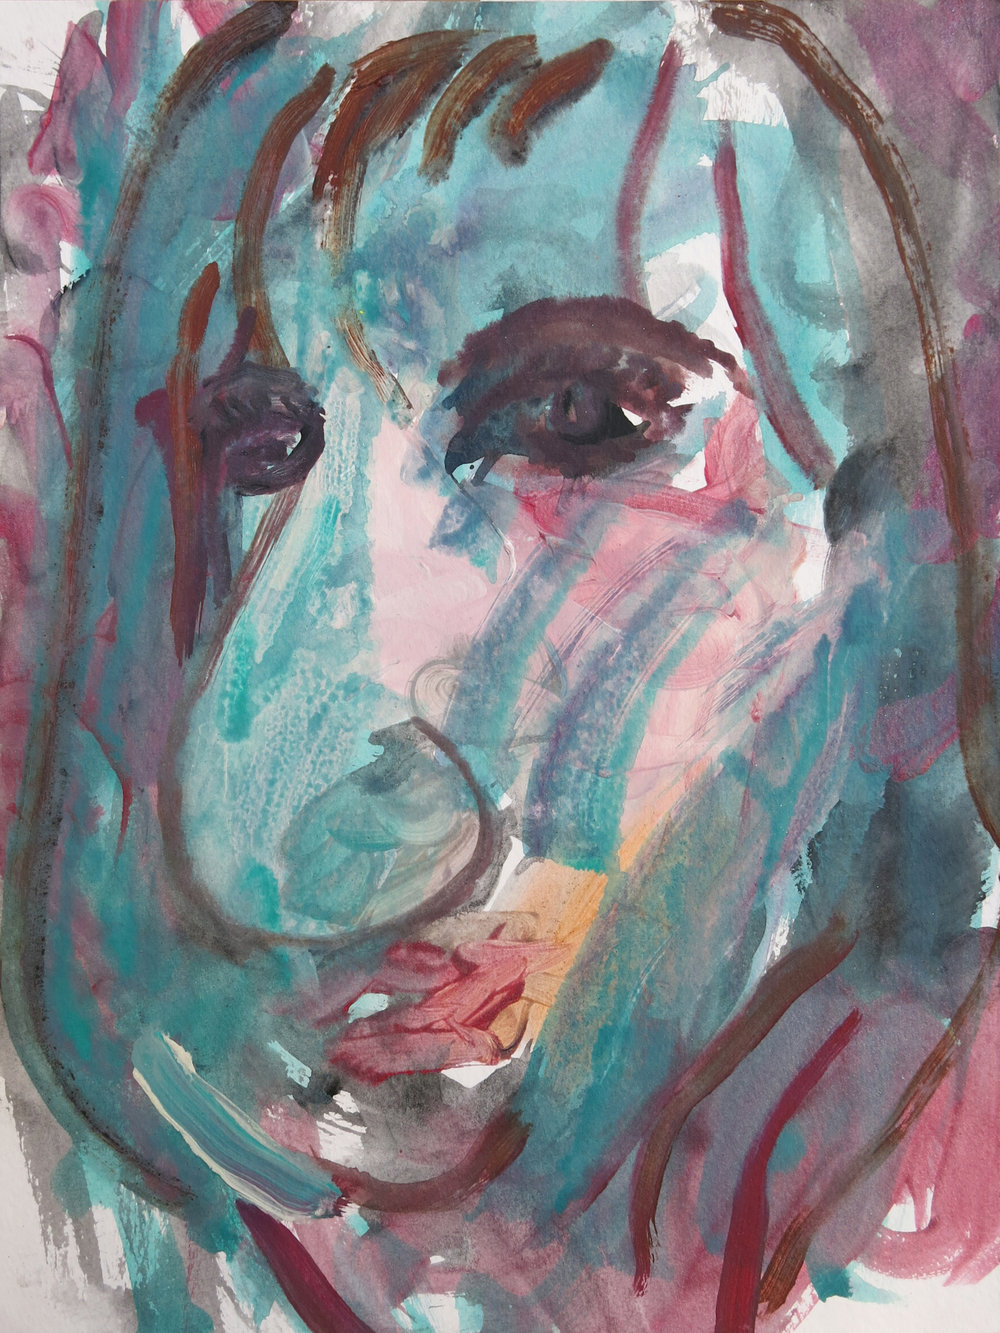 Barbra Streisand Portrait #134